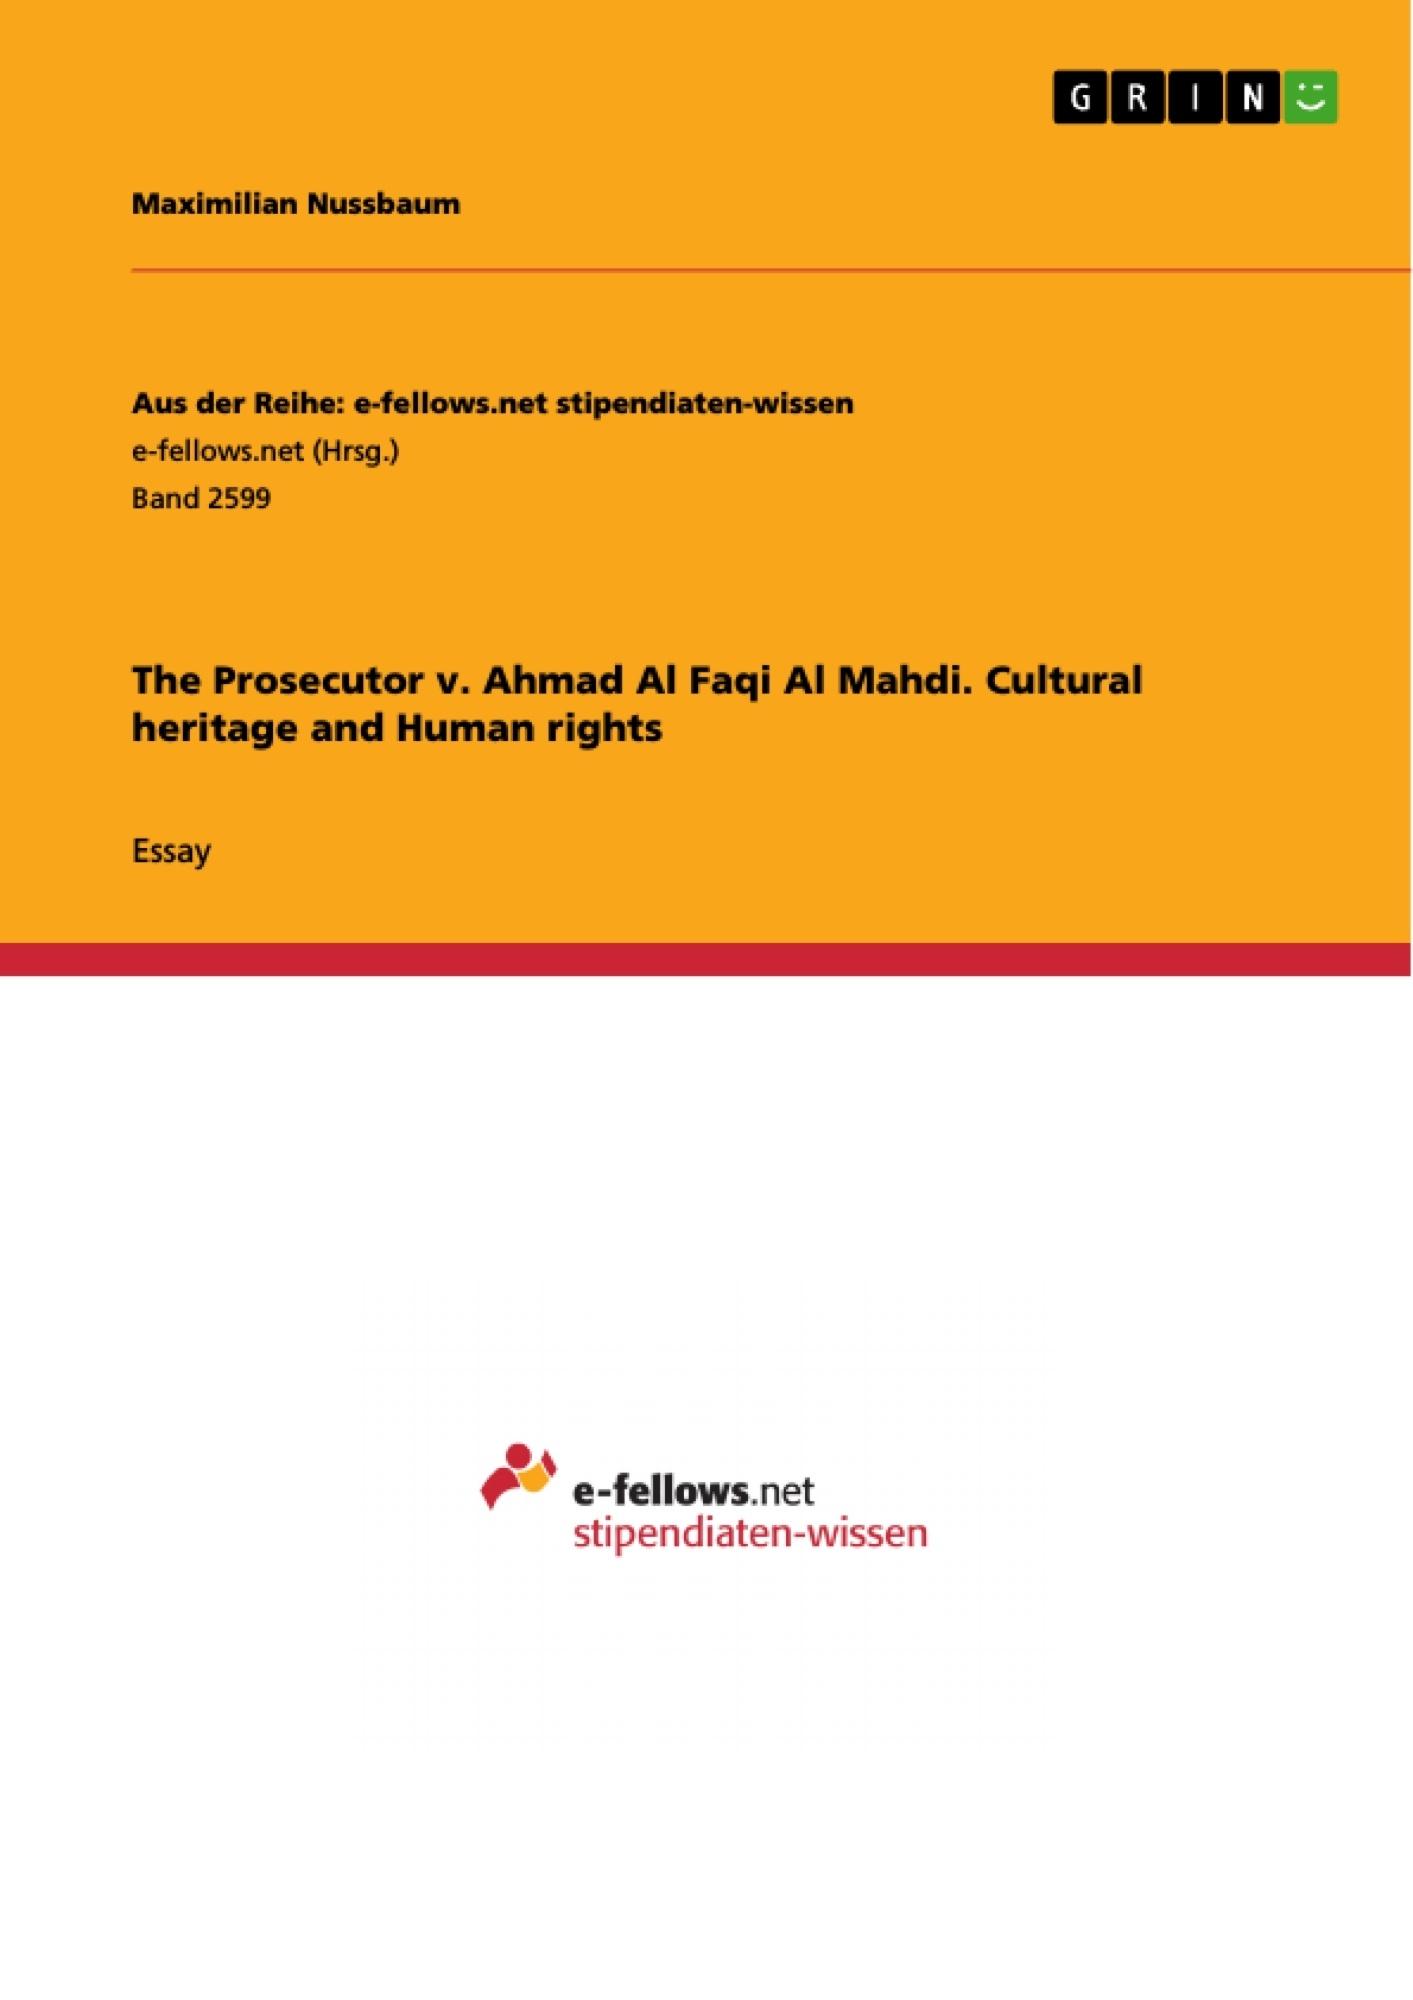 Title: The Prosecutor v. Ahmad Al Faqi Al Mahdi. Cultural heritage and Human rights